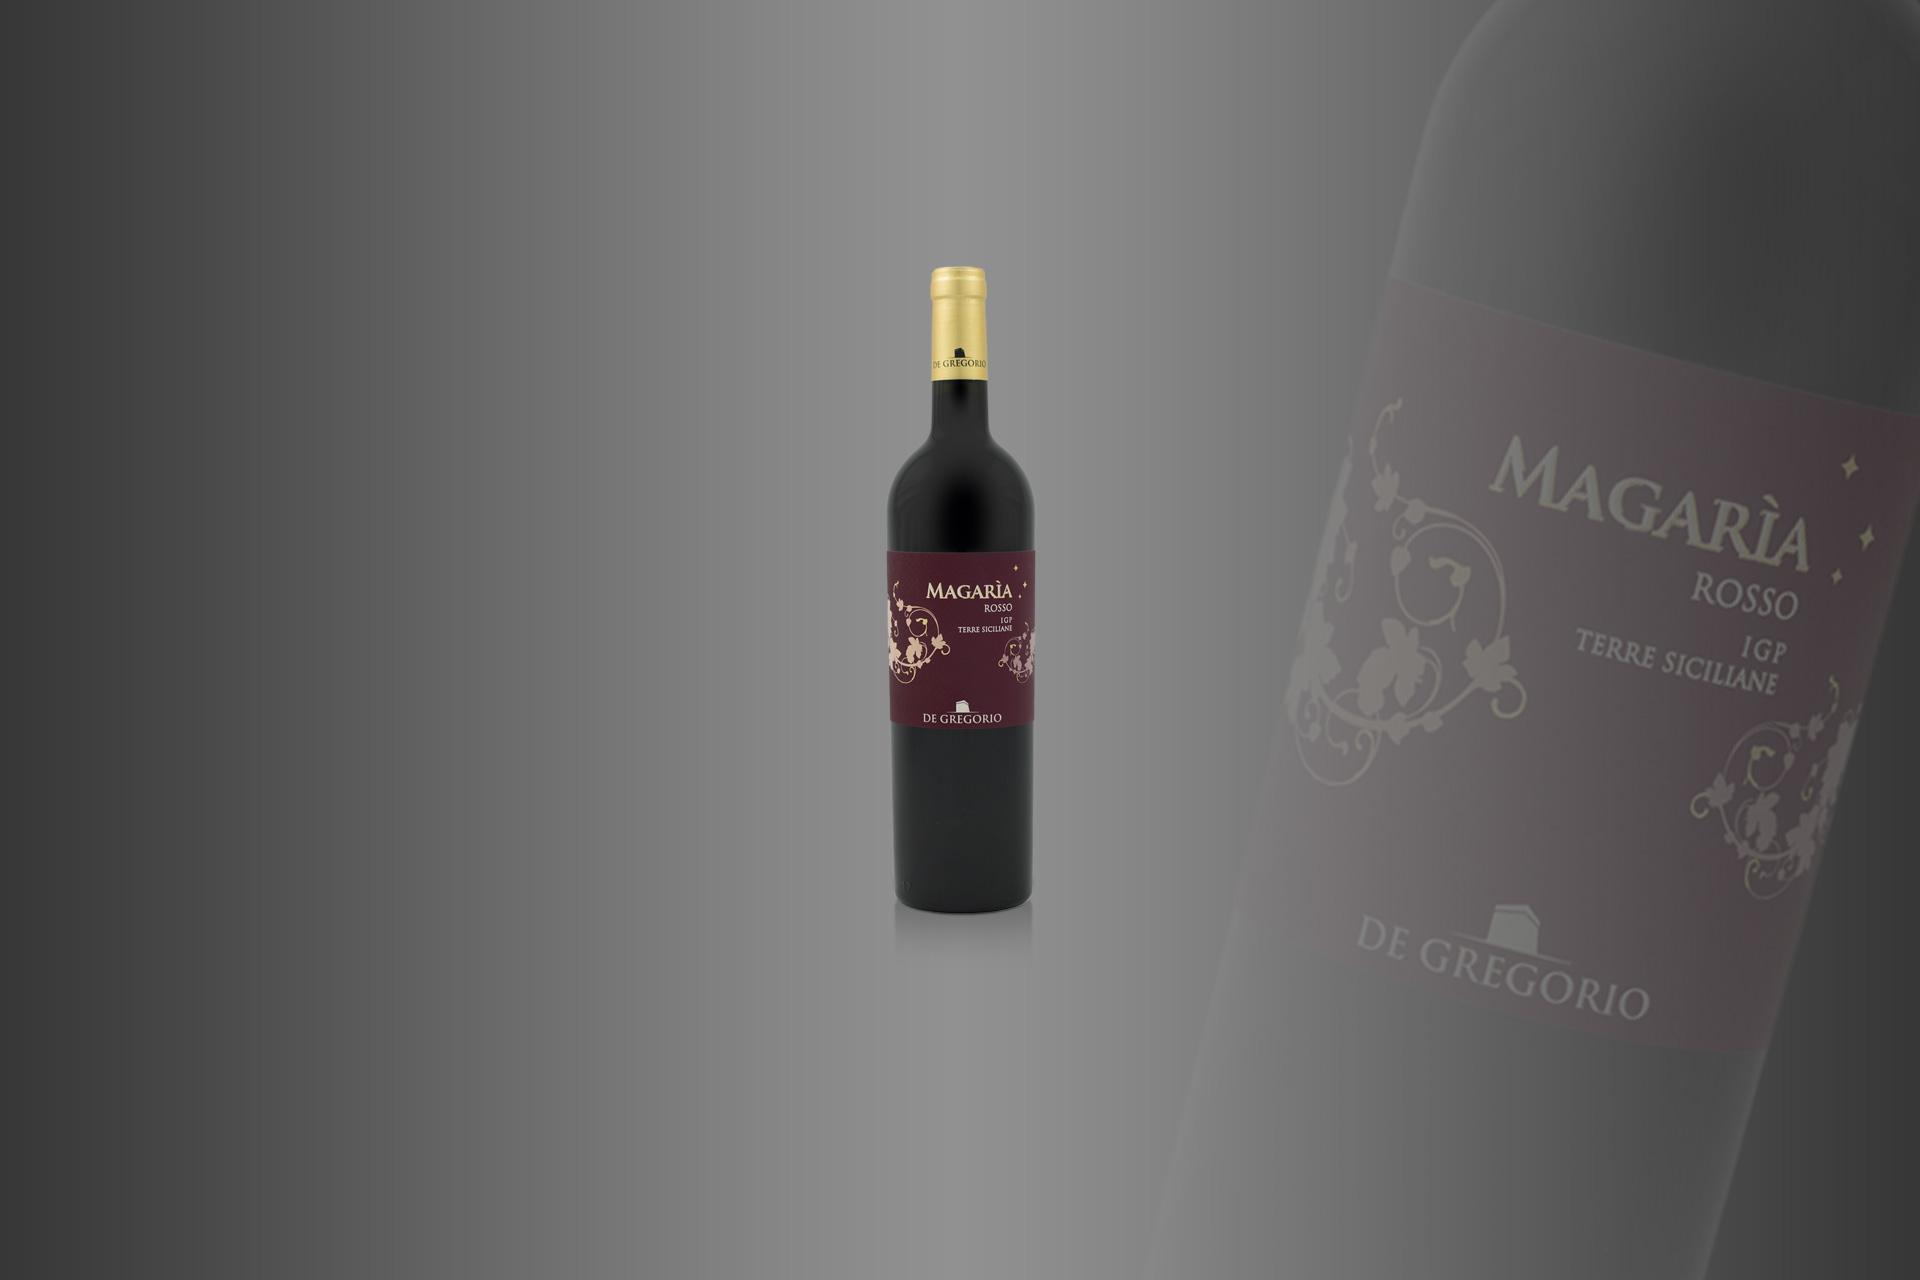 Magarìa Rosso IGP Terre Siciliane